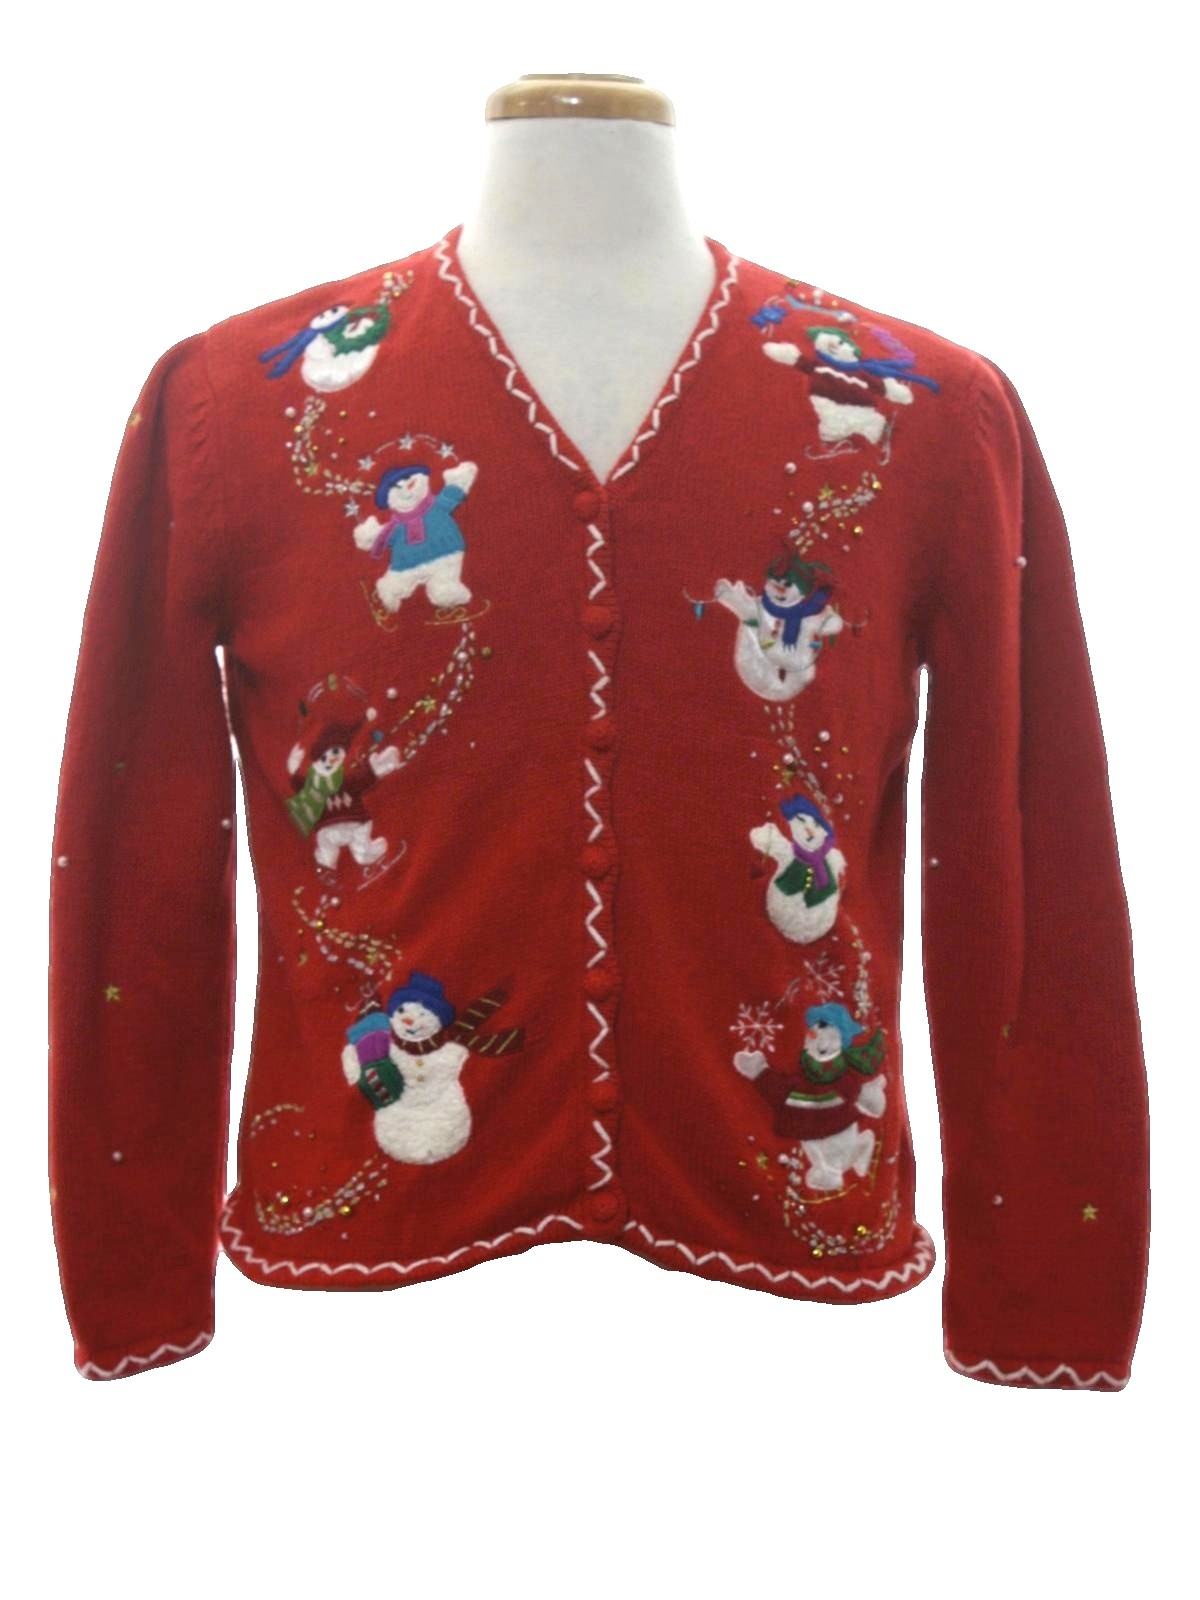 Womens Ugly Christmas Cardigan Sweater: -Designers Originals ...